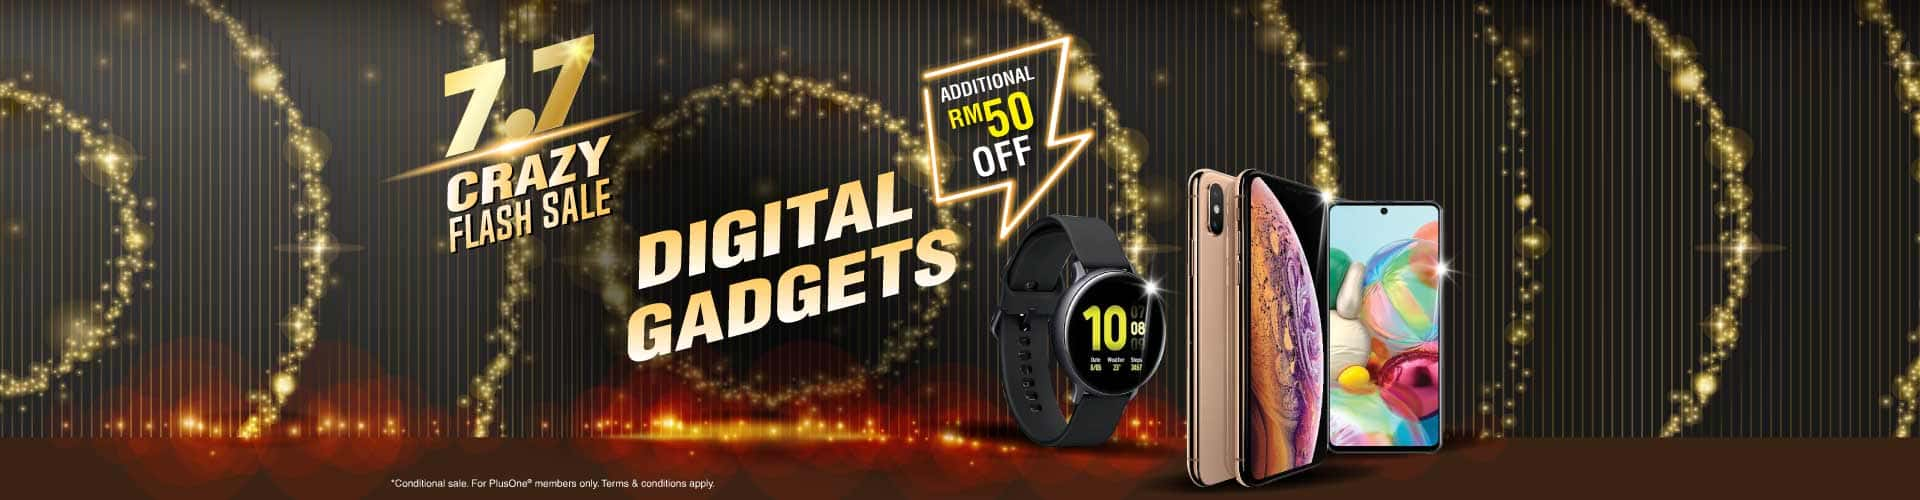 7.7 digital gadgets